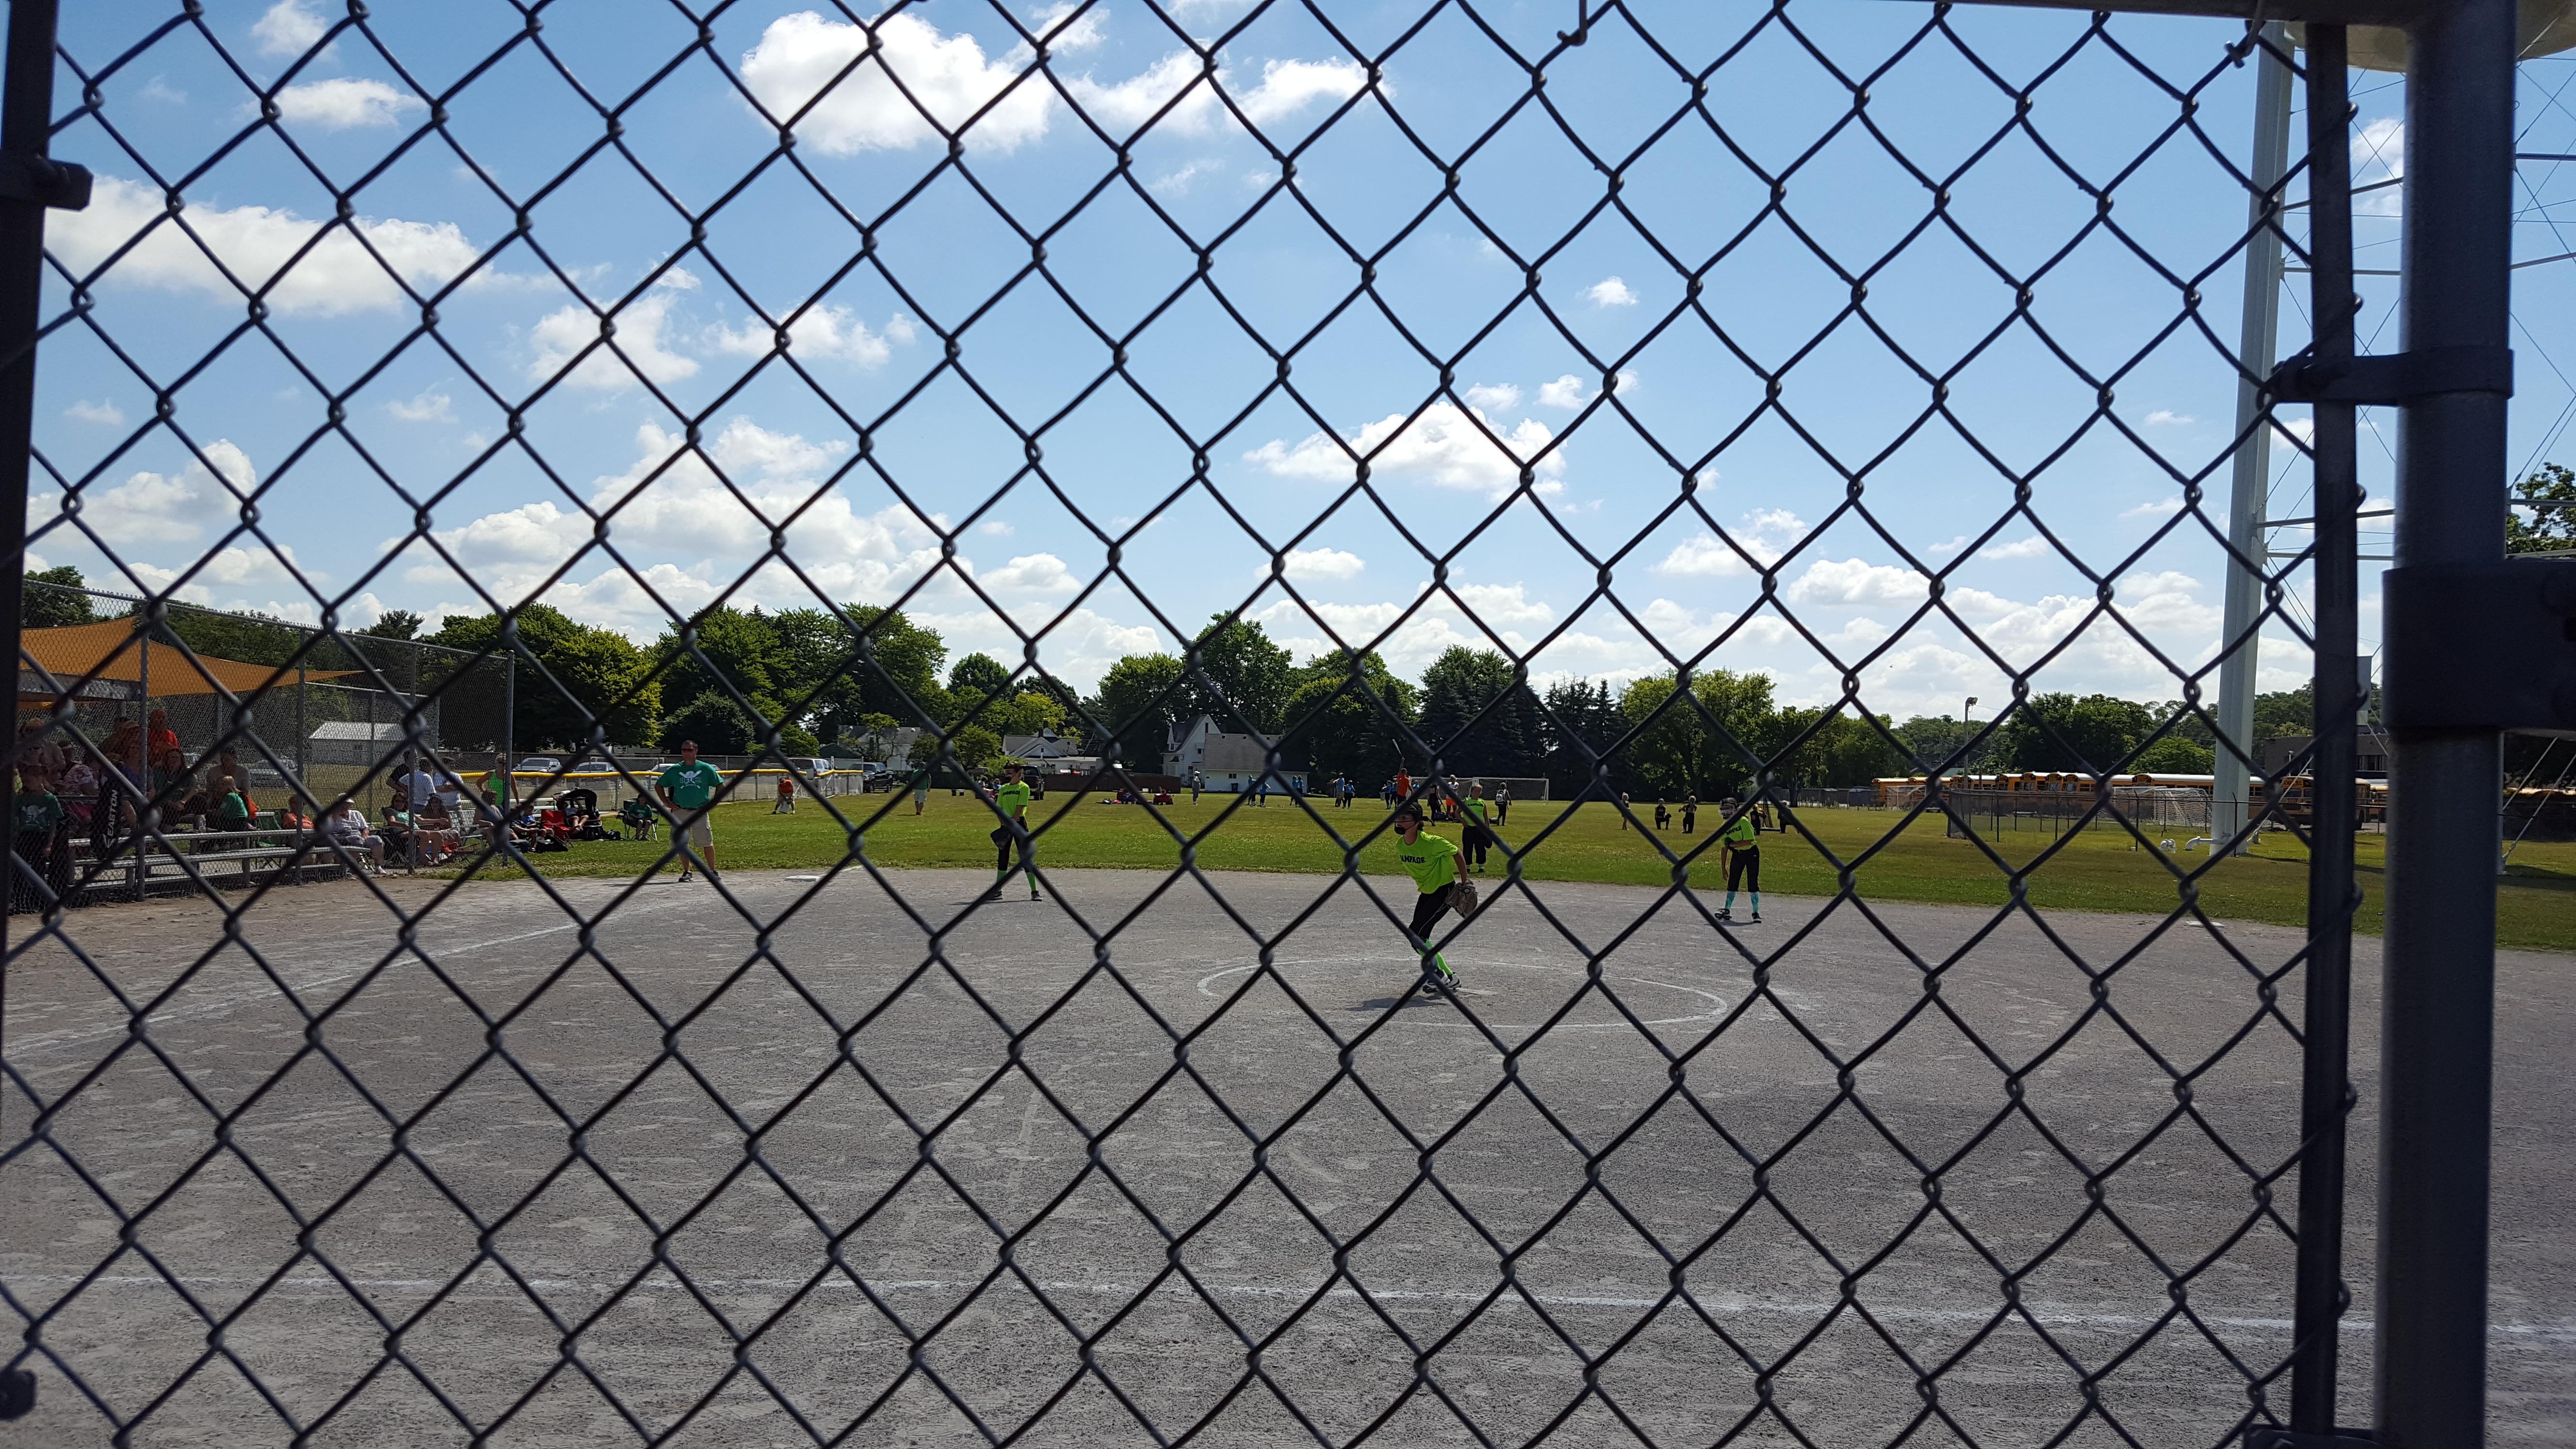 Softball Tournament July, 2016 - Swanton (24)